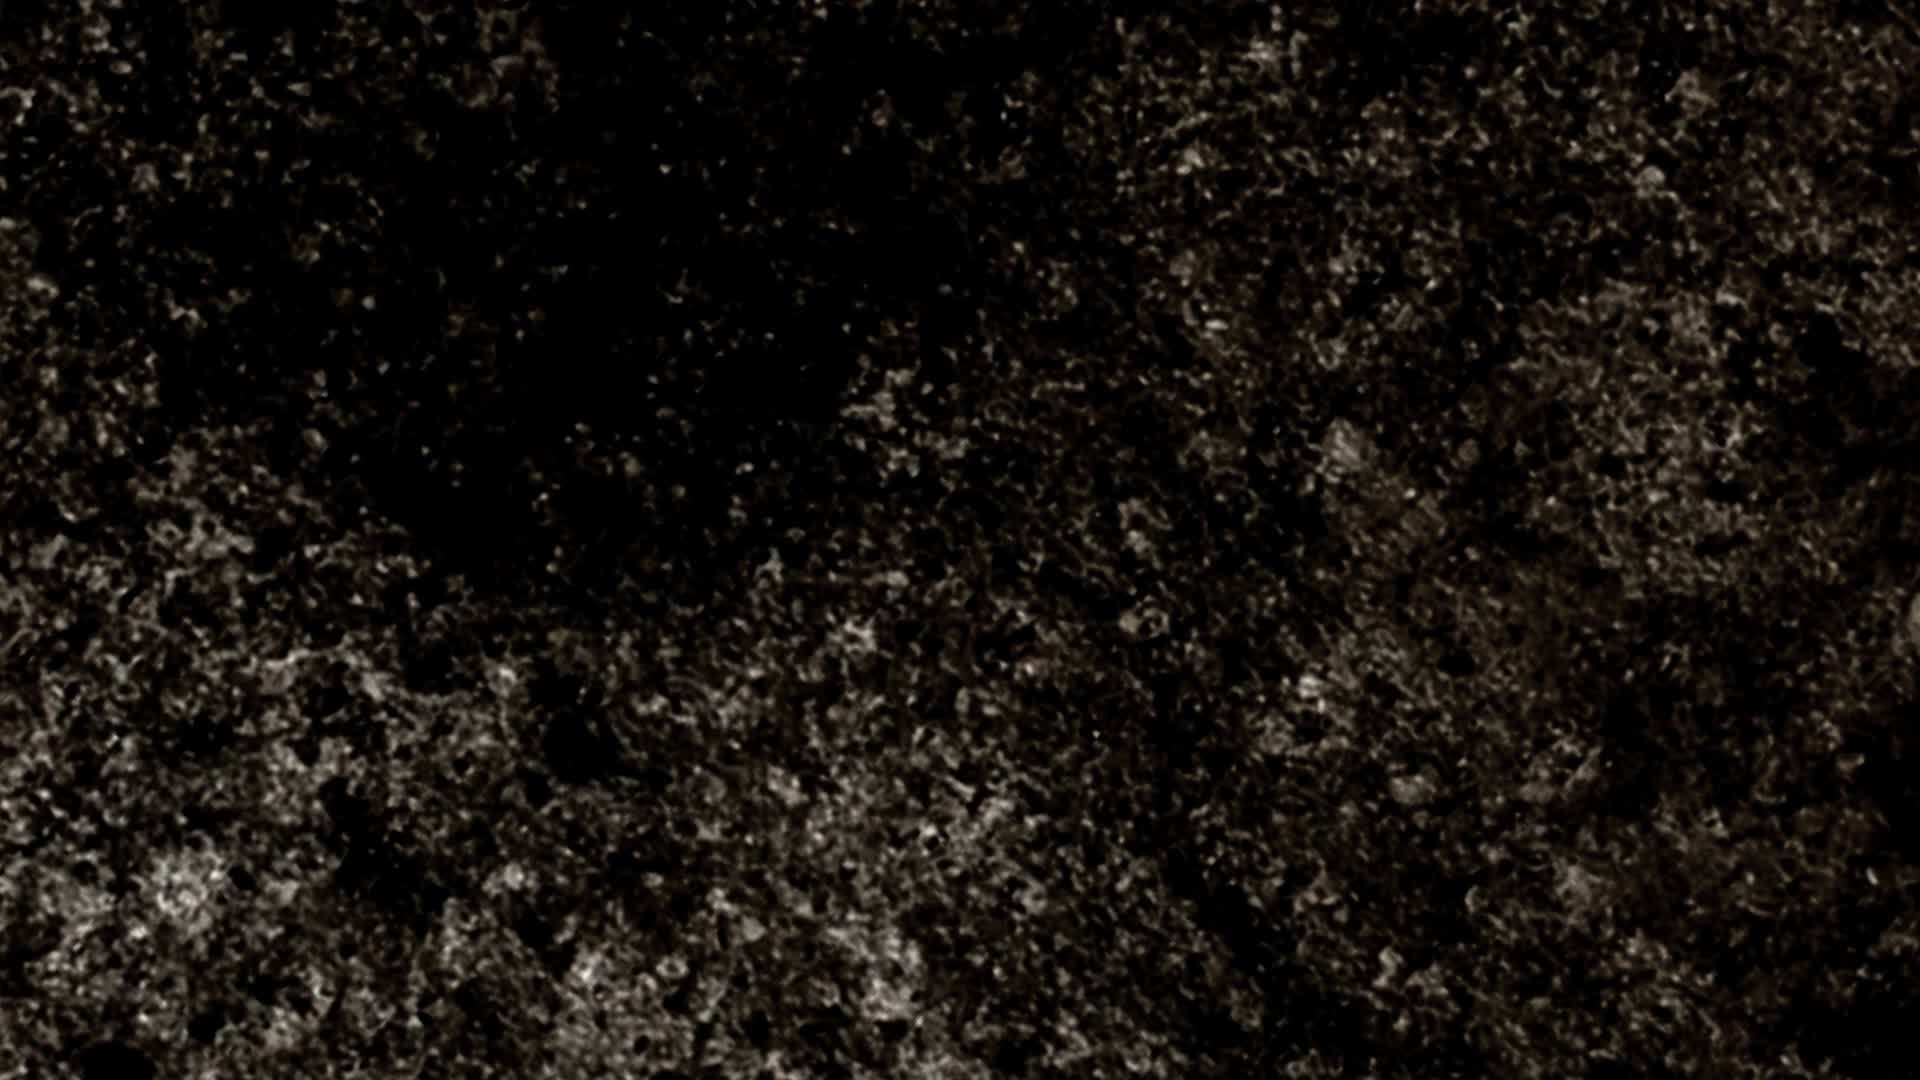 Film Dirt Texture Video Clip 22897847 Pond5